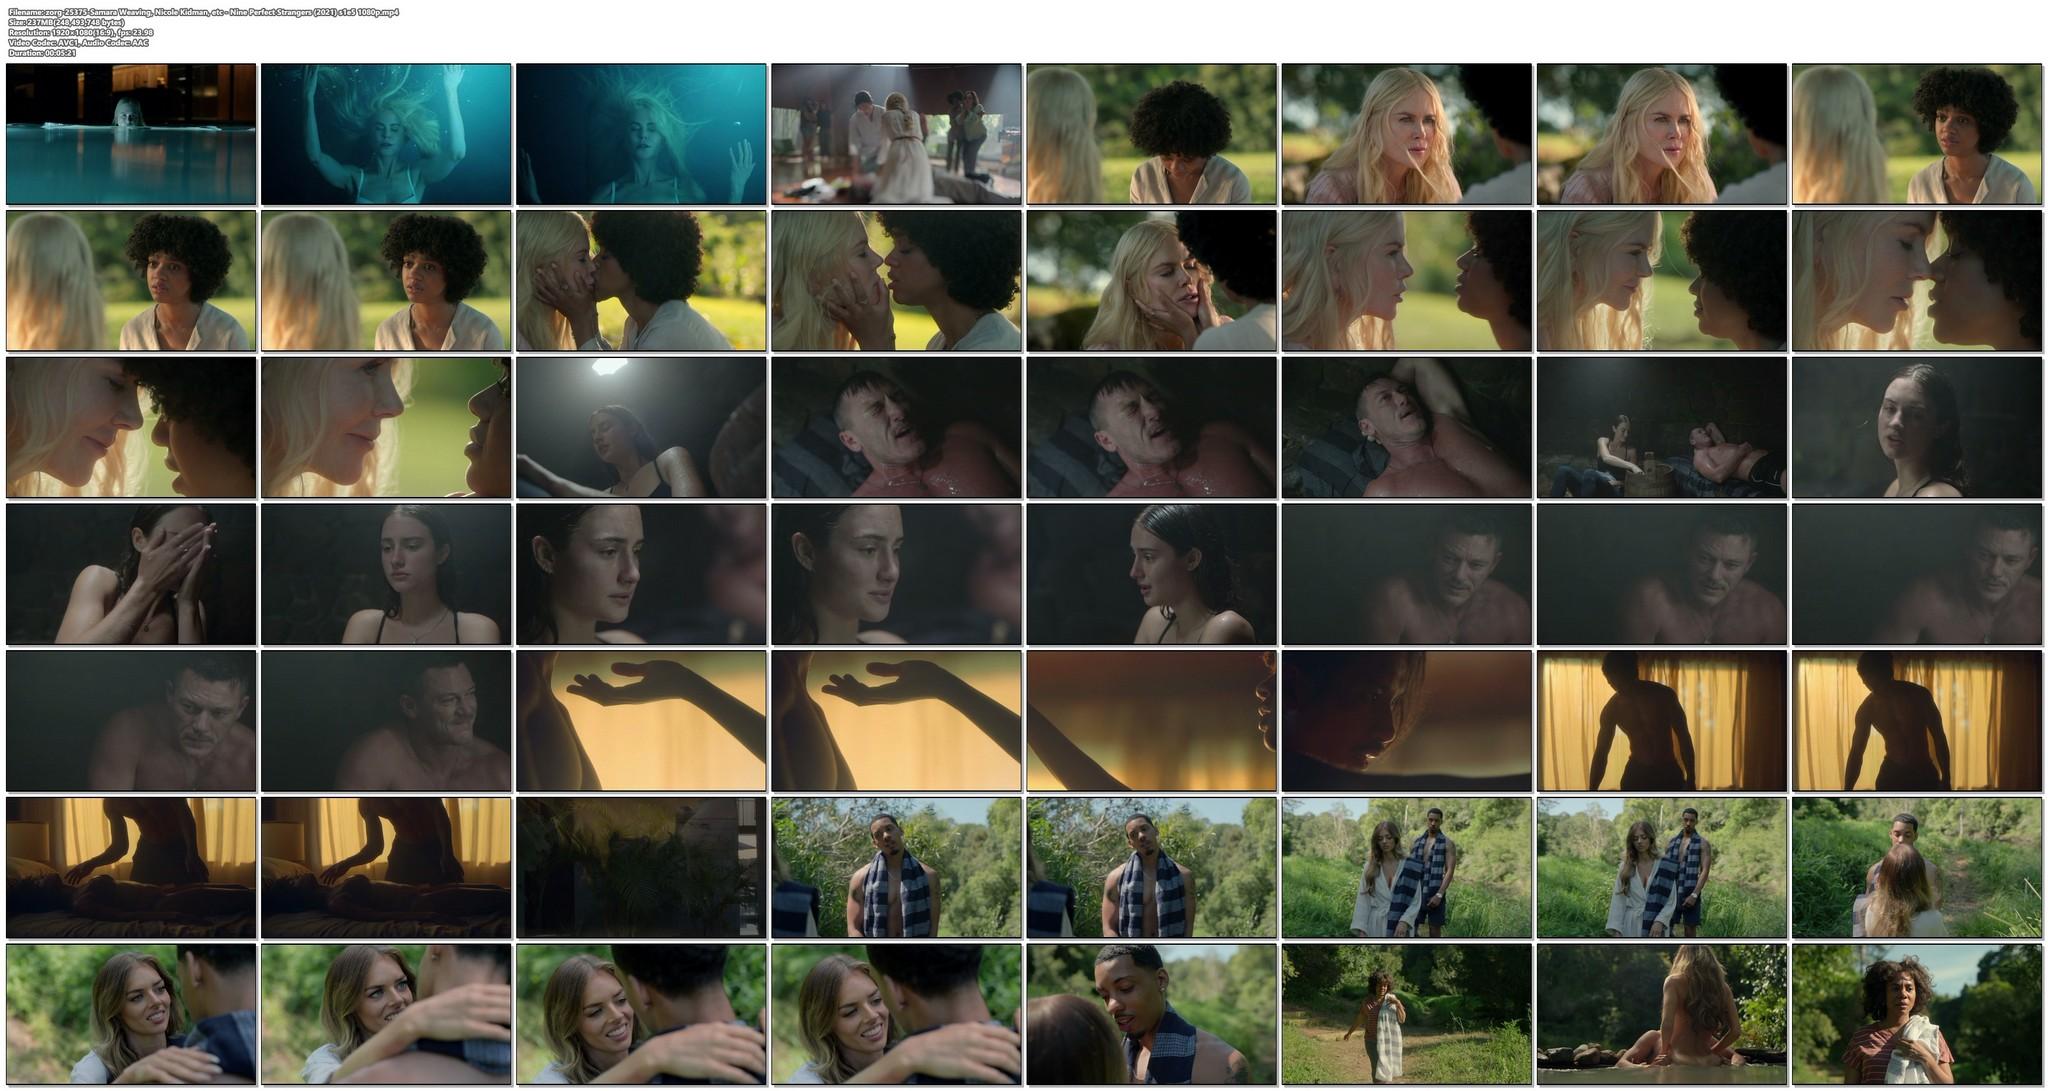 Samara Weaving hot sex Nicole Kidman and others sexy Nine Perfect Strangers 2021 s1e5 1080p 17